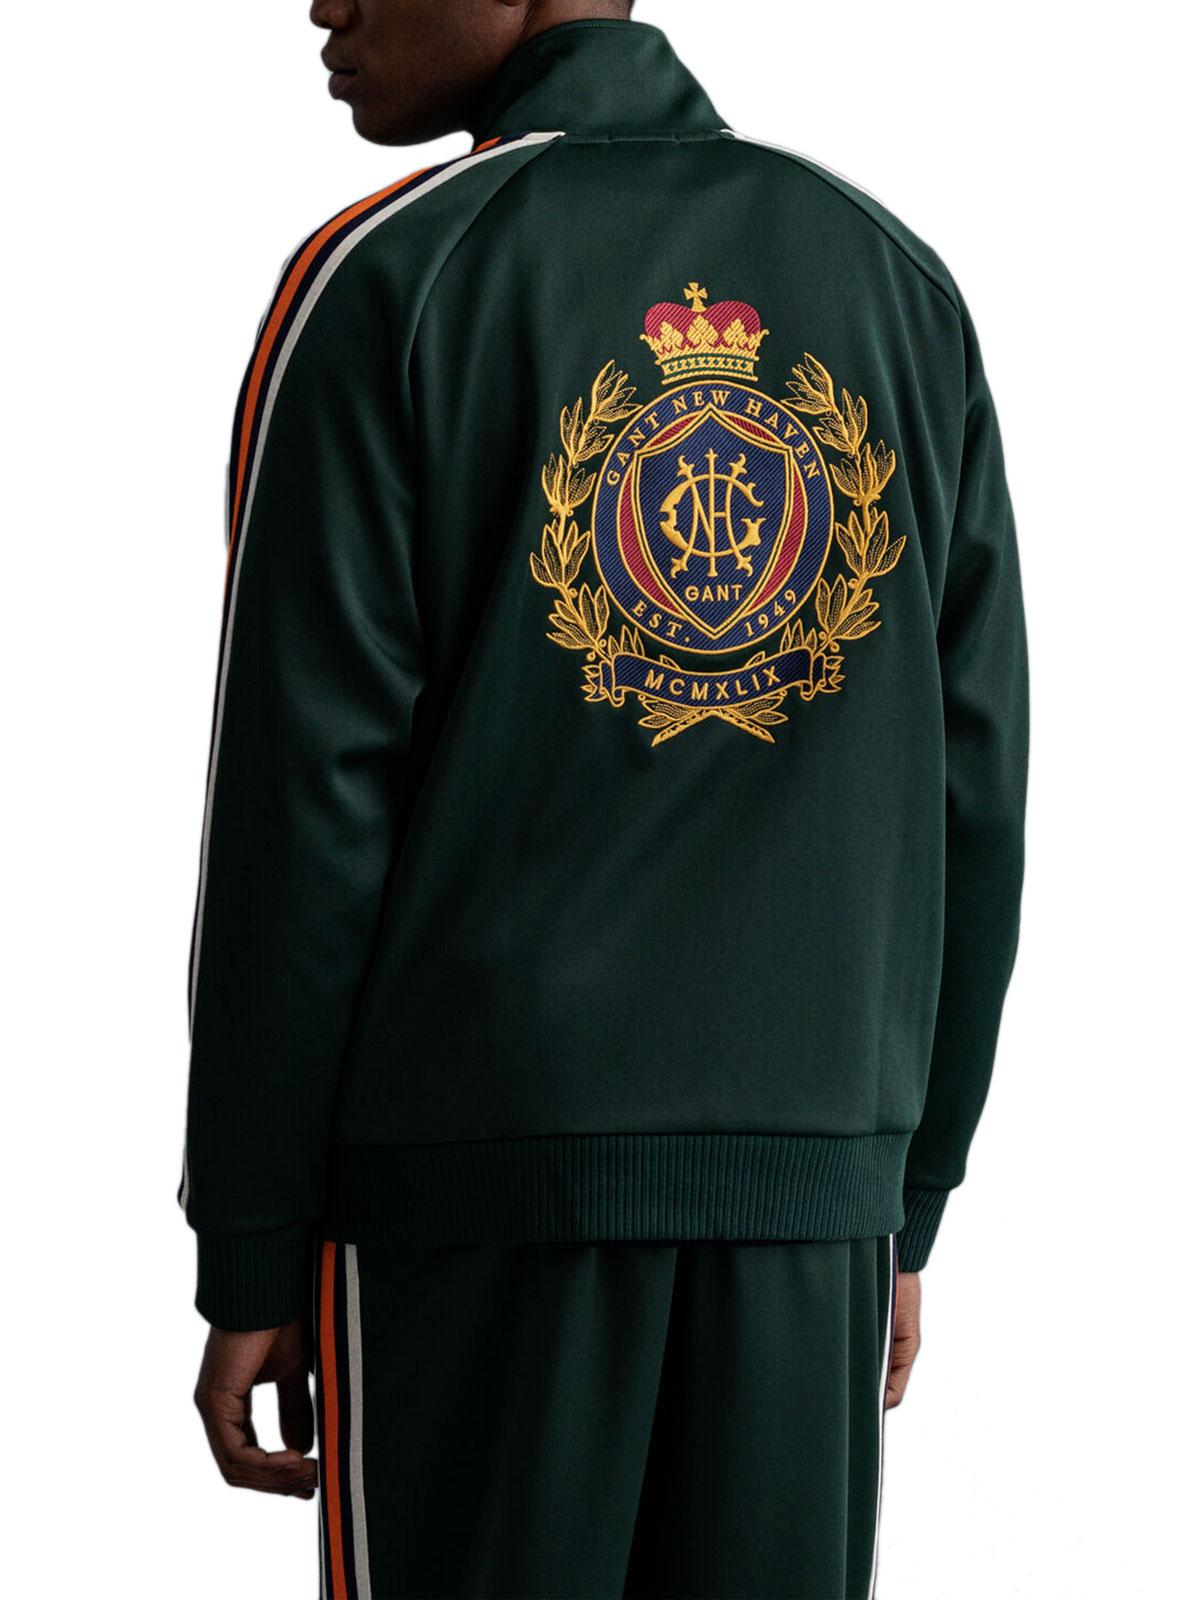 Immagine di Gant | Felpe D1. Gant Royal Crest Tracksuit Jkt